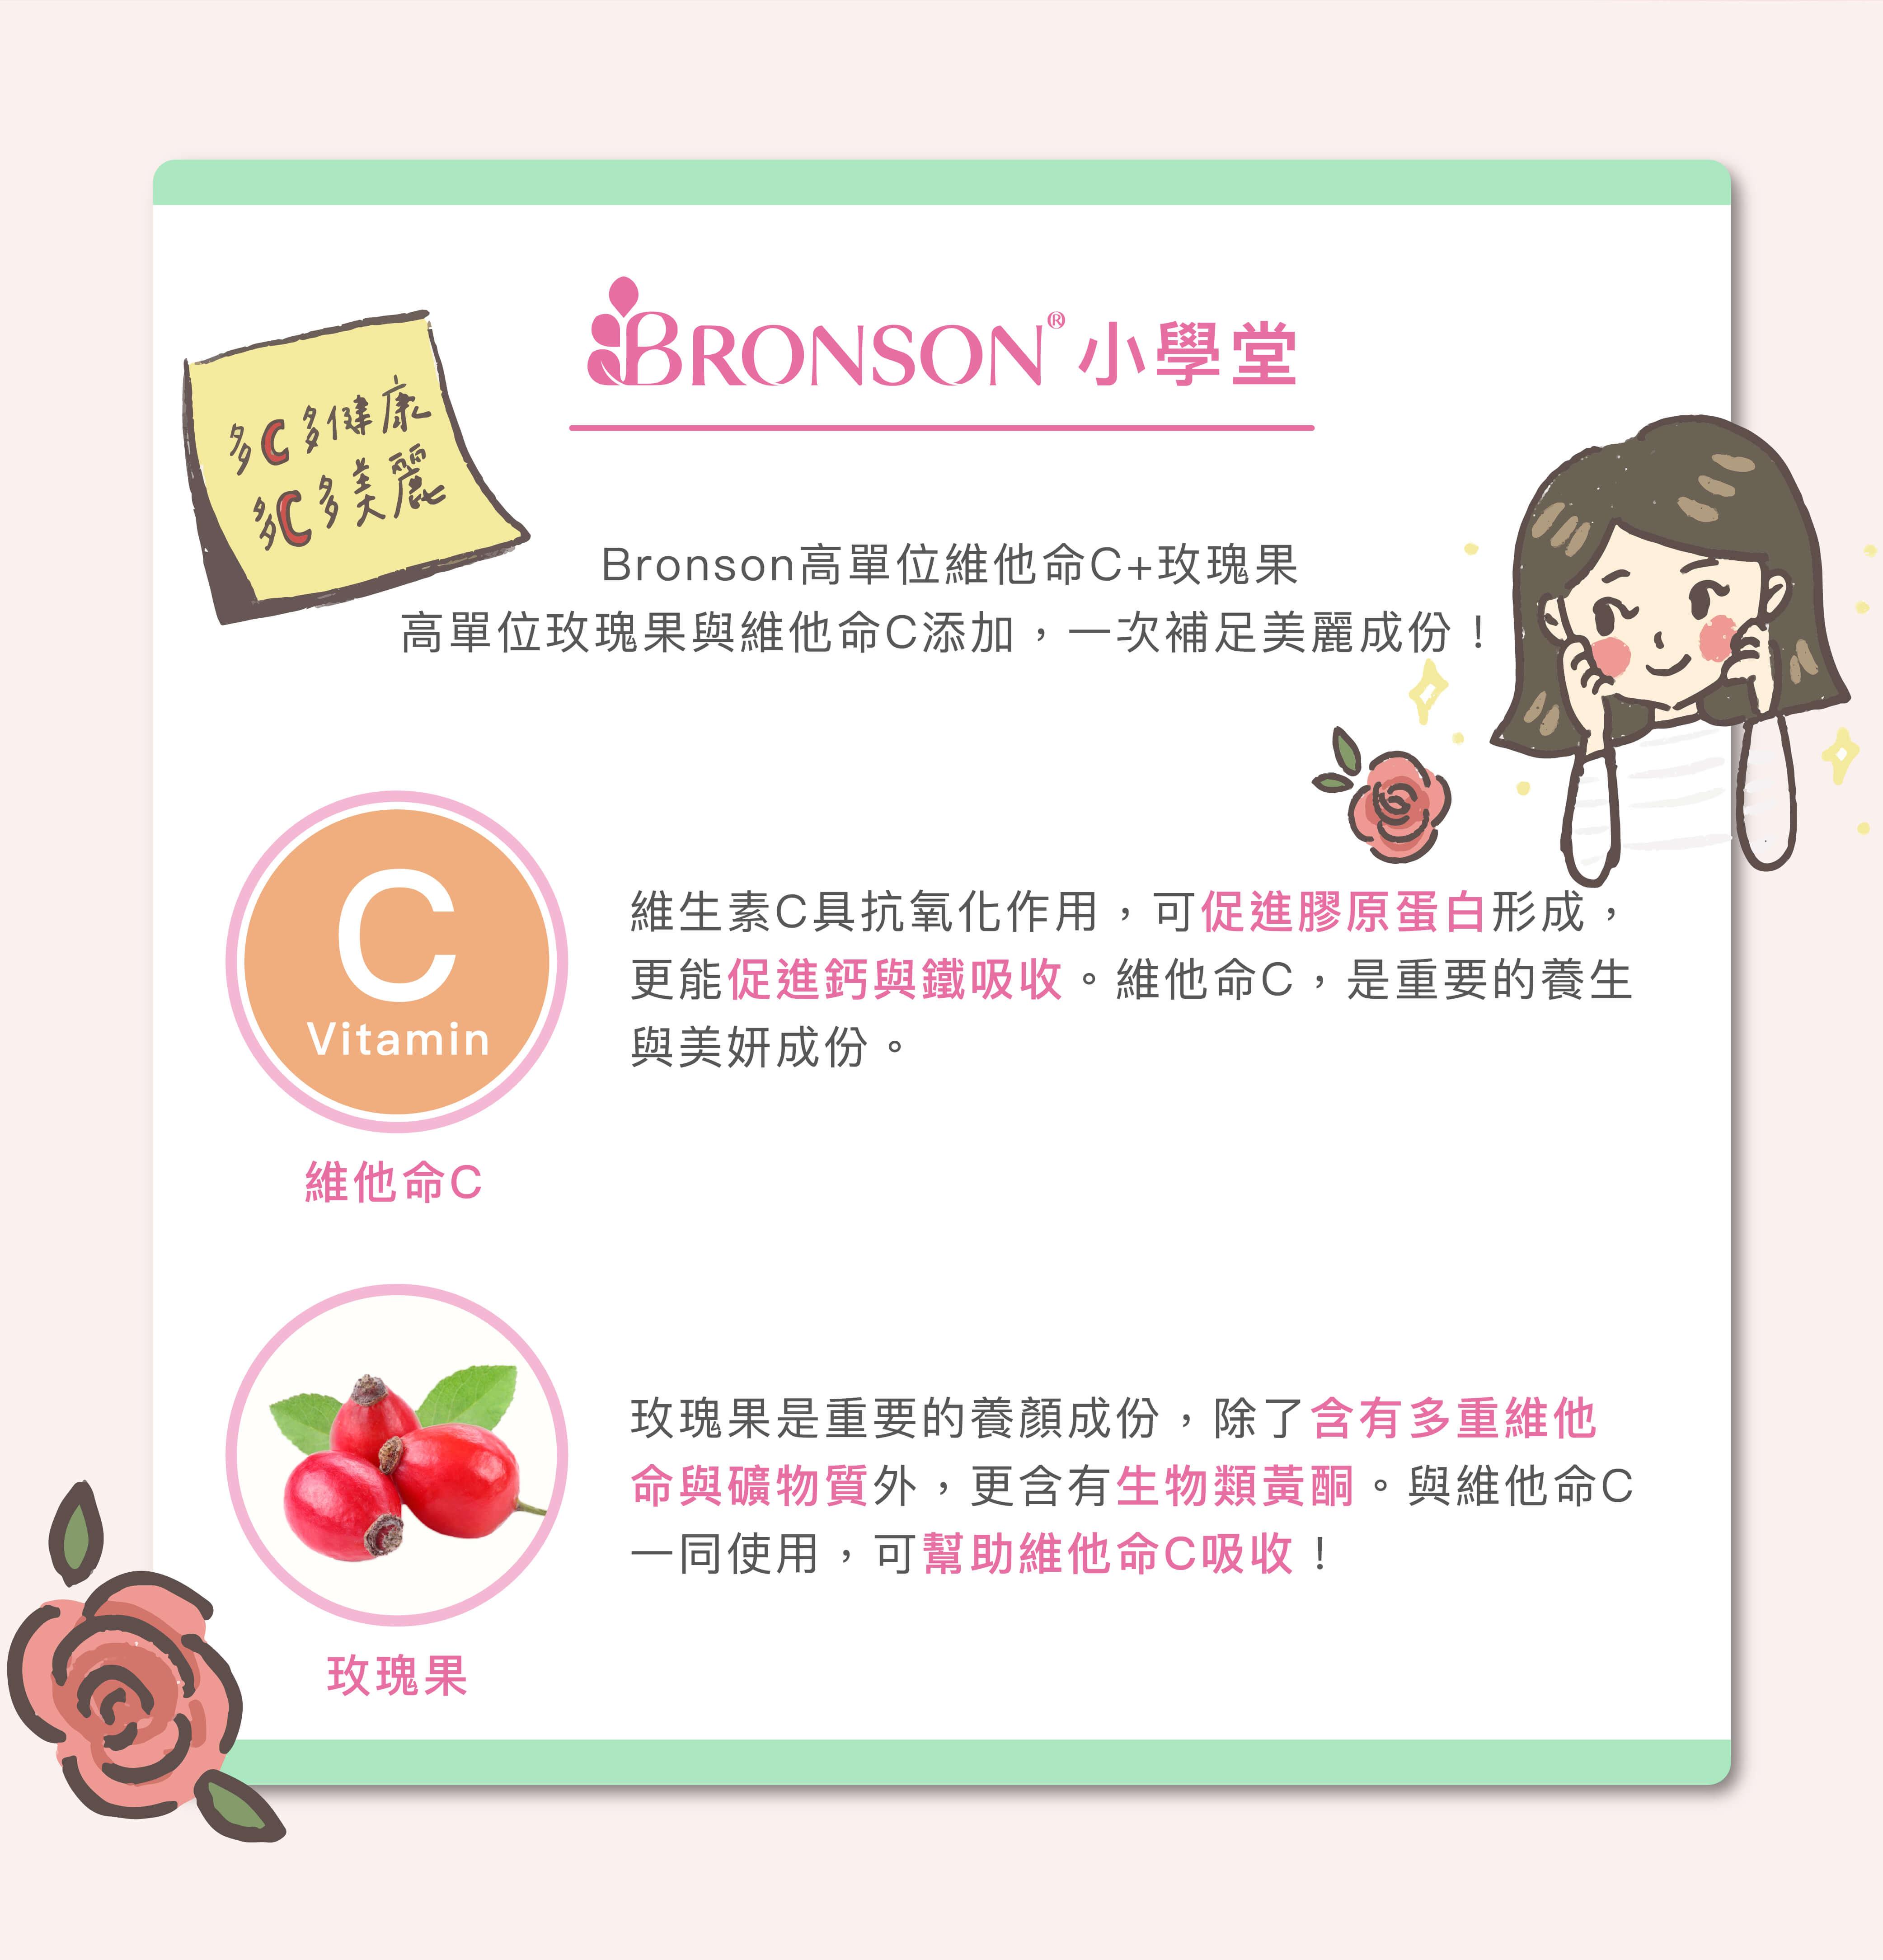 Branson 維他命C+玫瑰果_final_ol-05.jpg